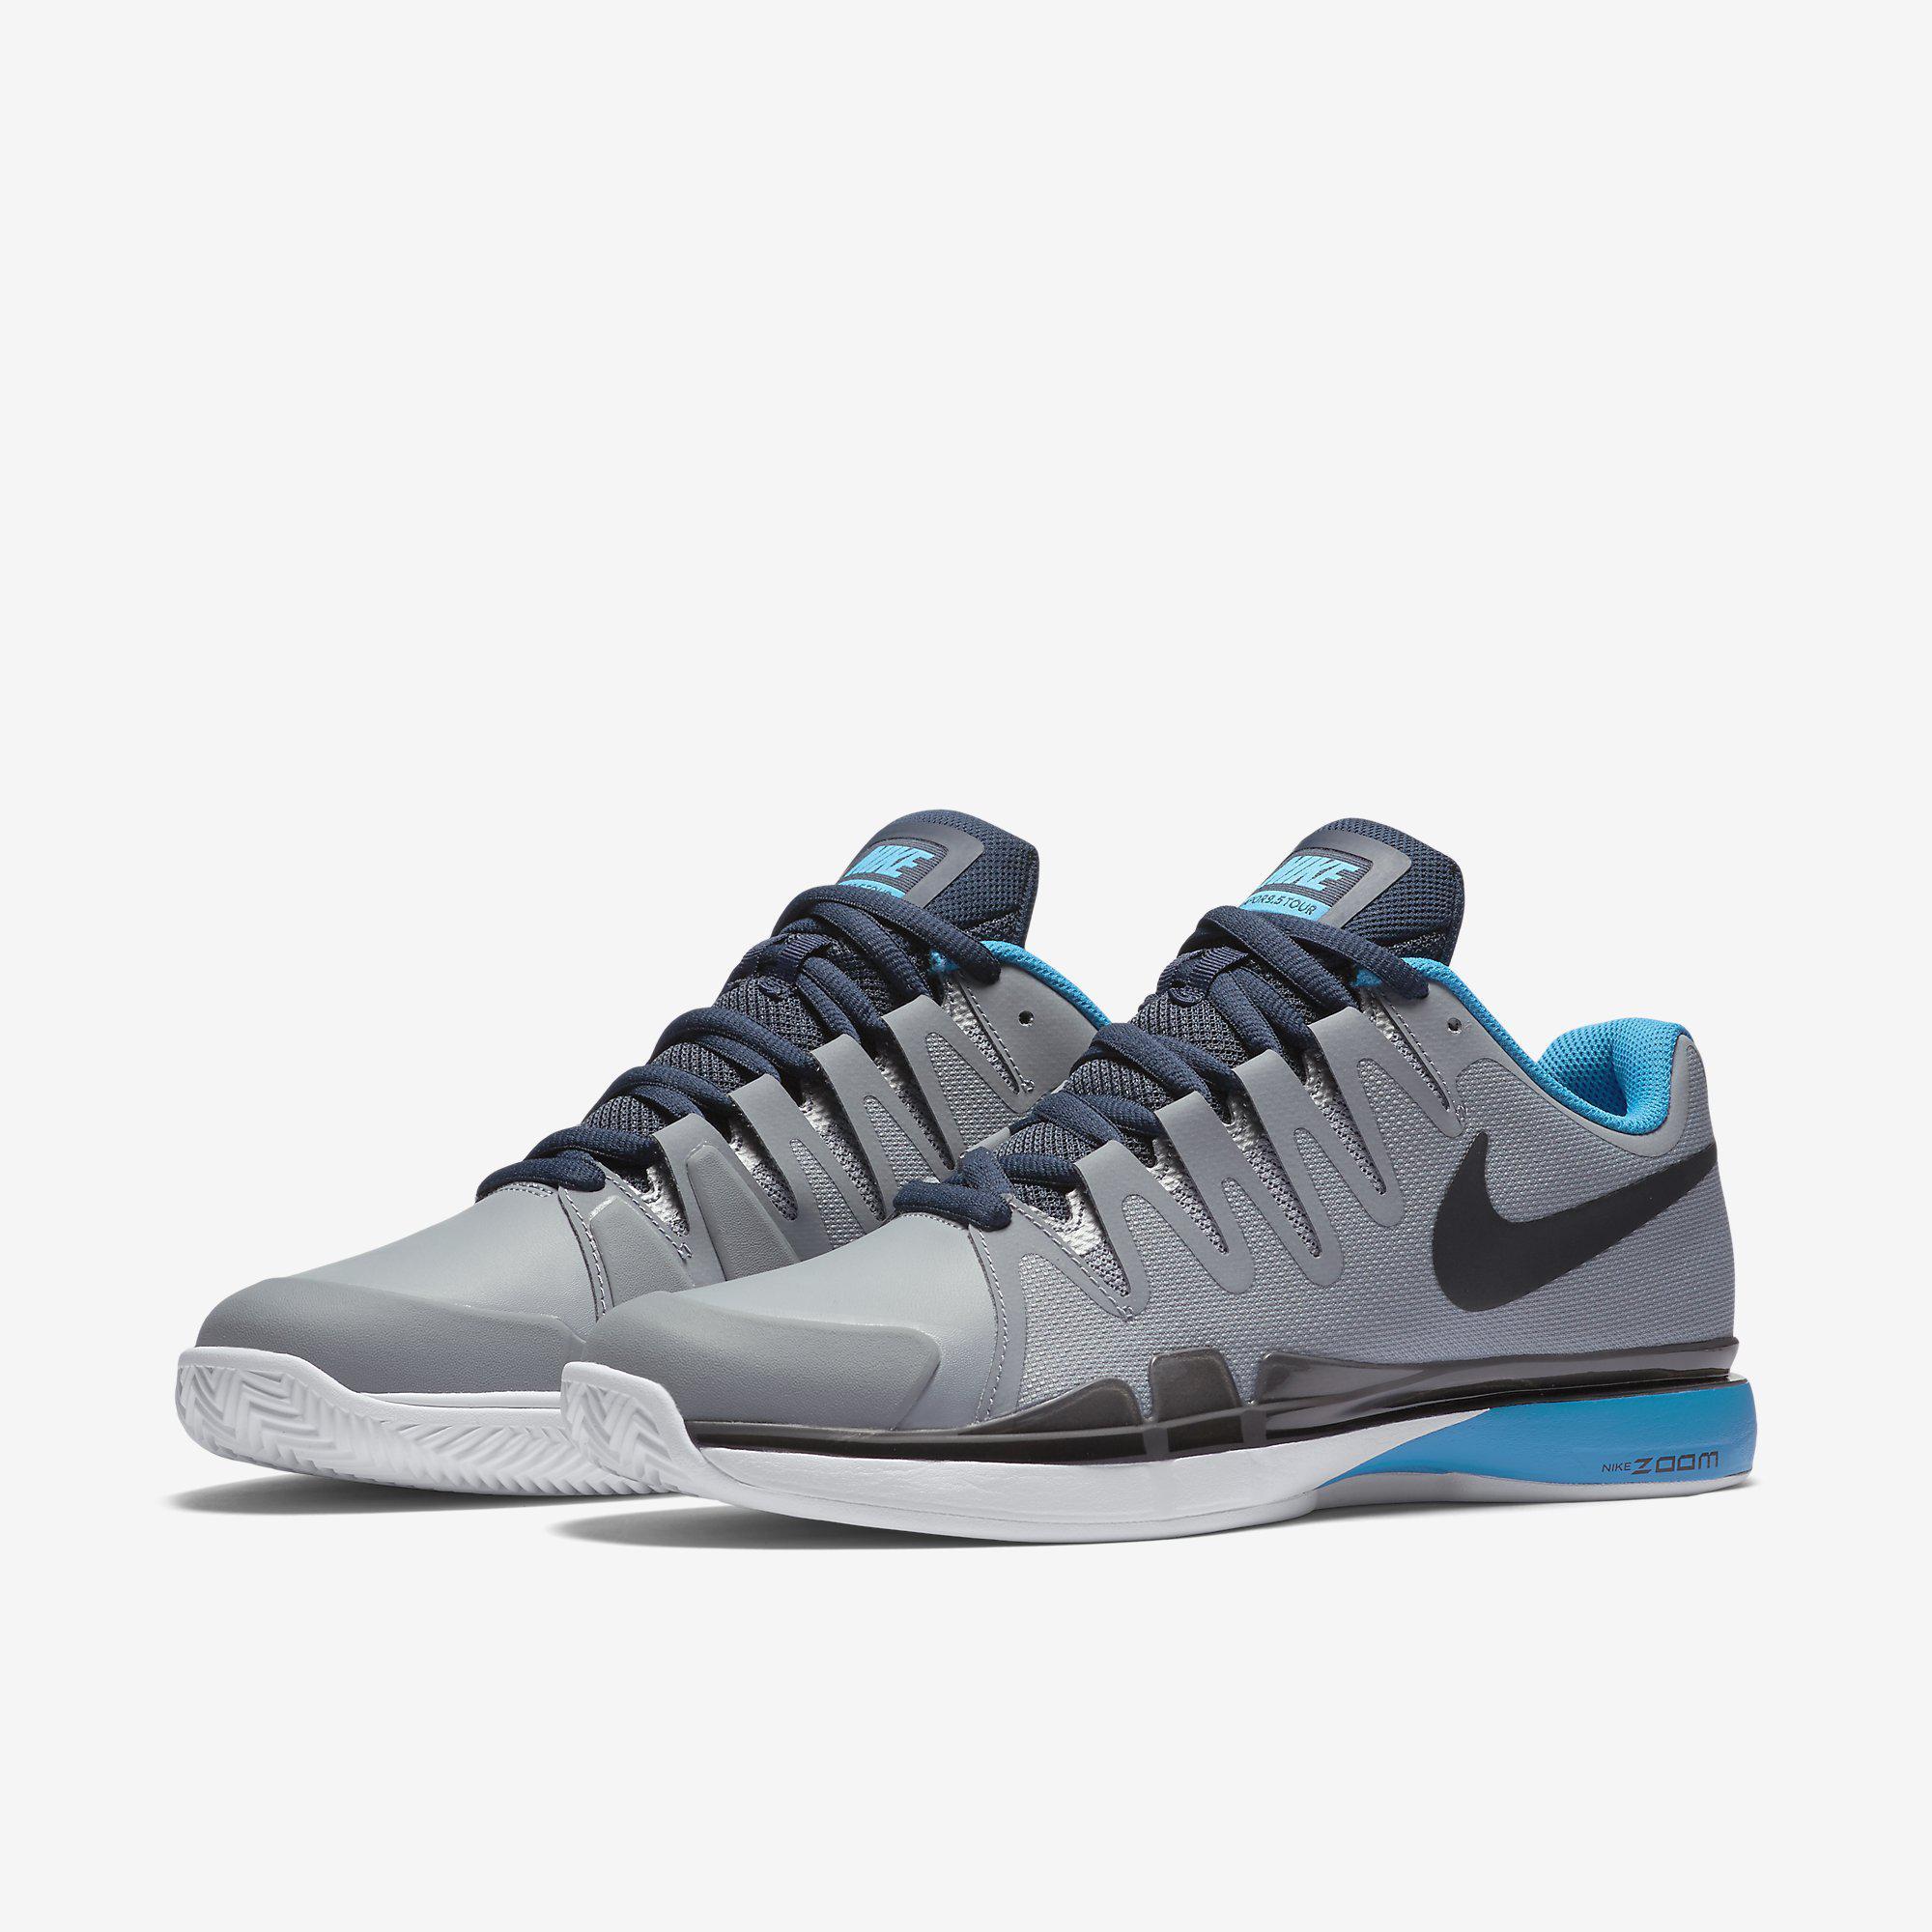 db611f4931809 Nike Mens Zoom Vapor 9.5 Tour Clay Court Tennis Shoes - Grey Blue ...